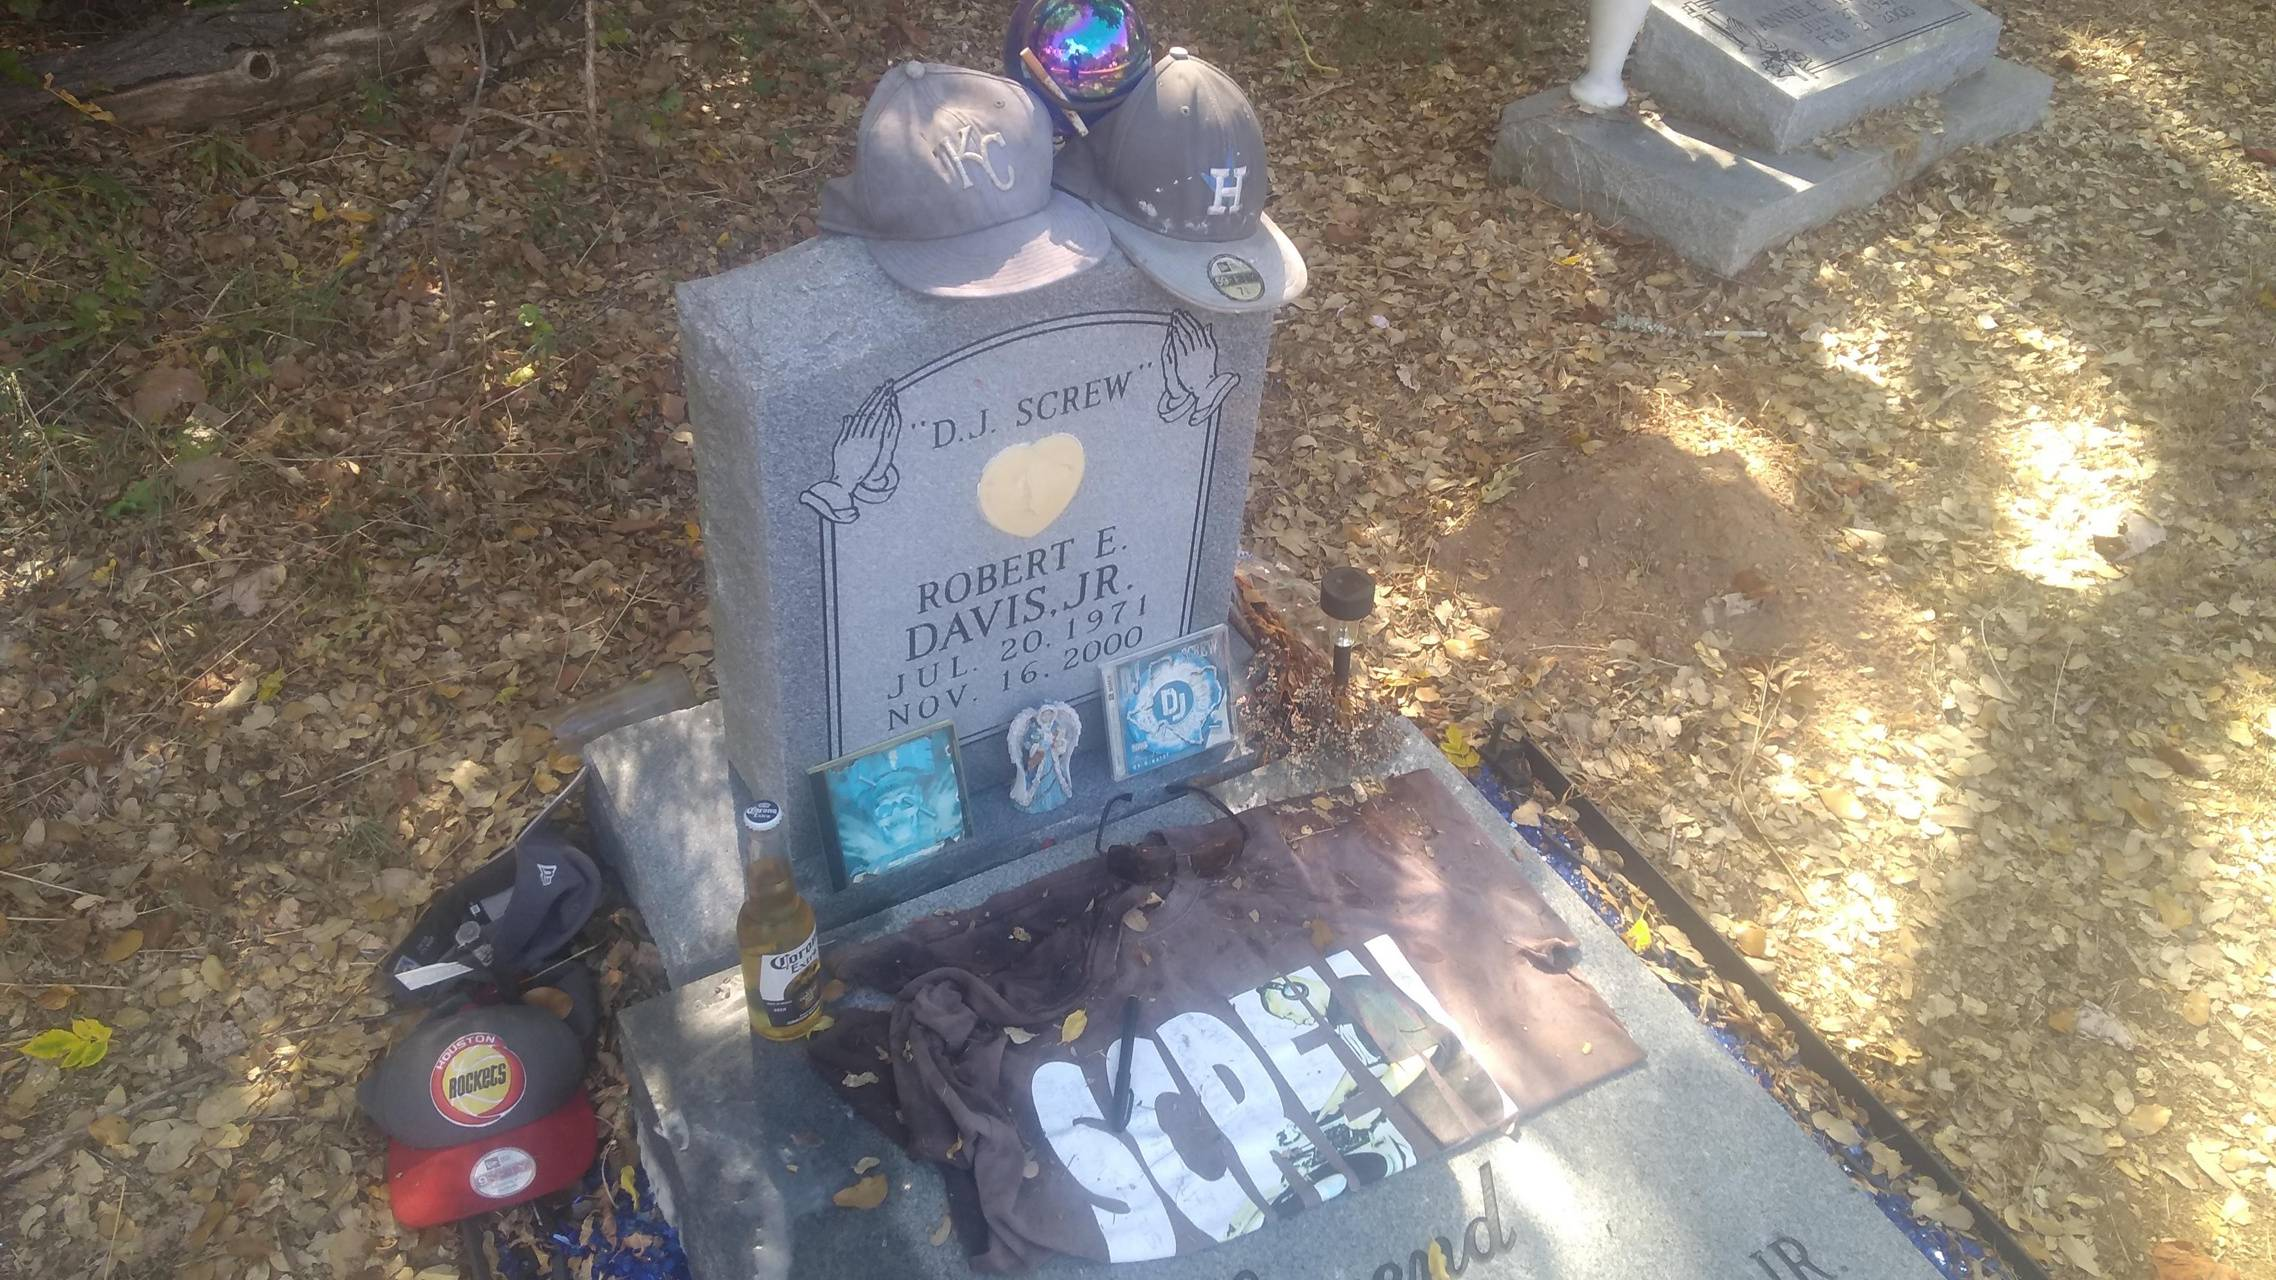 DJ S***w grave